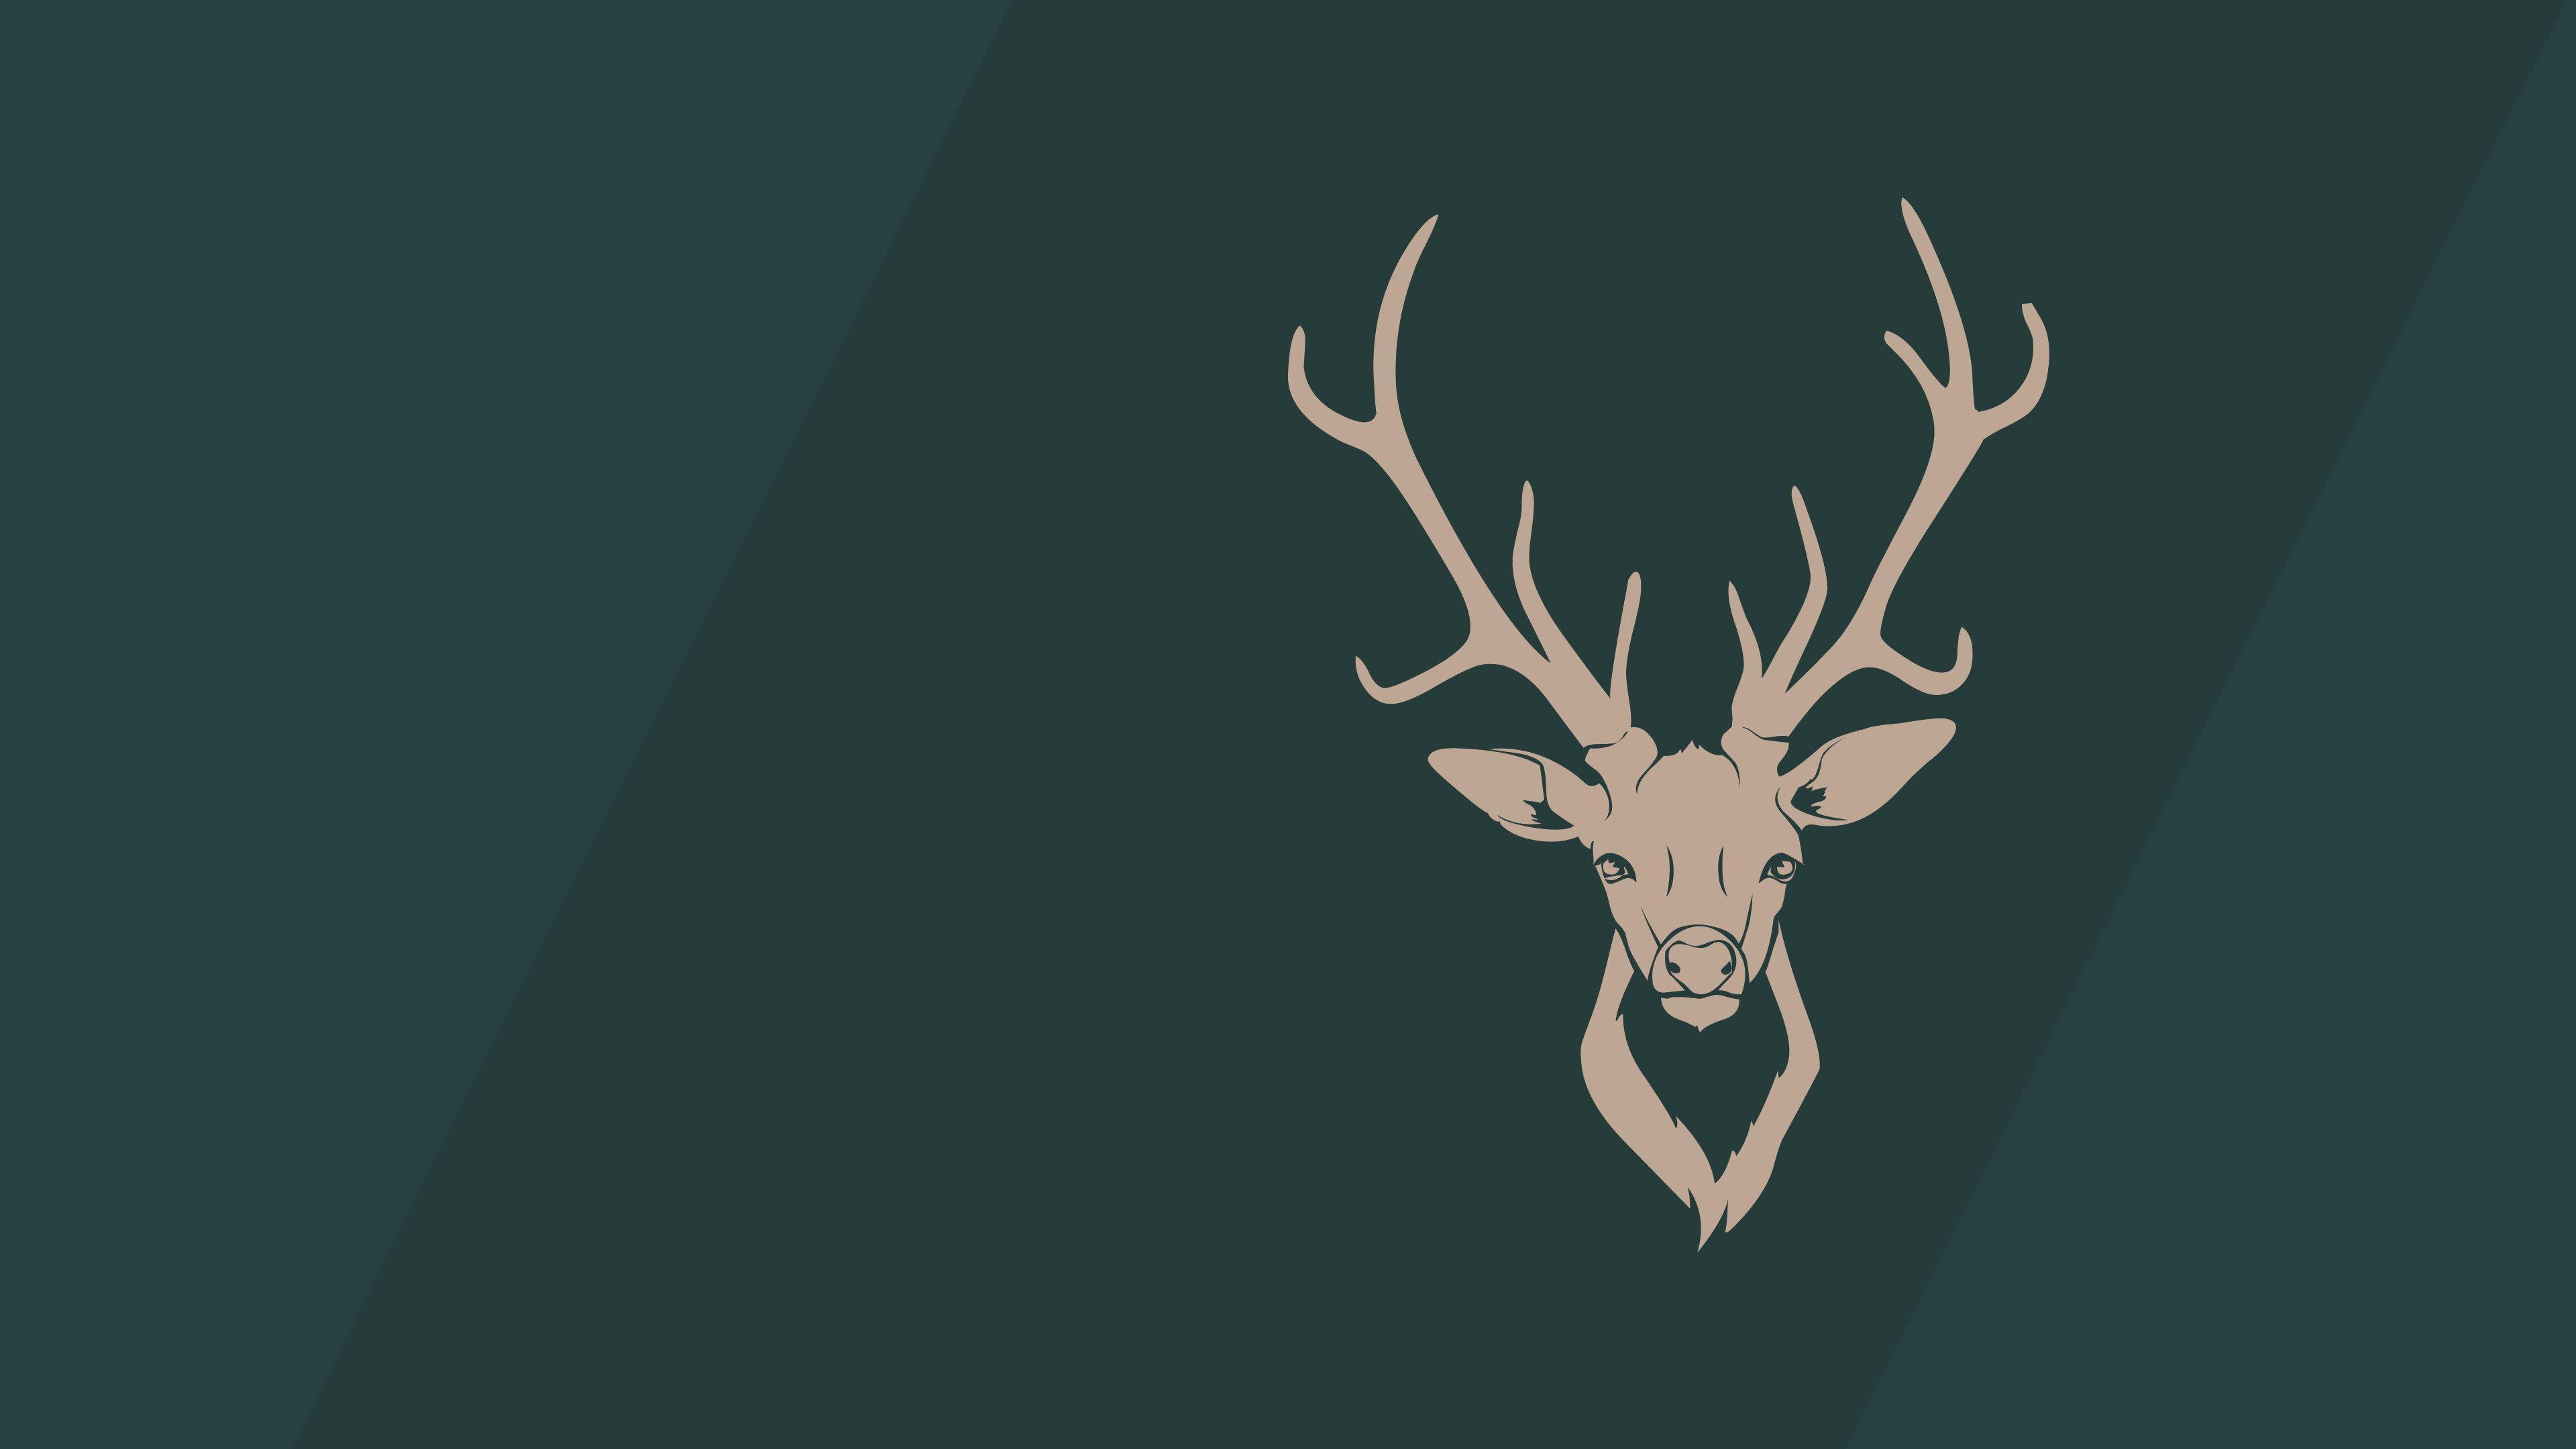 Abstract Deer Wallpapers Top Free Abstract Deer Backgrounds Wallpaperaccess